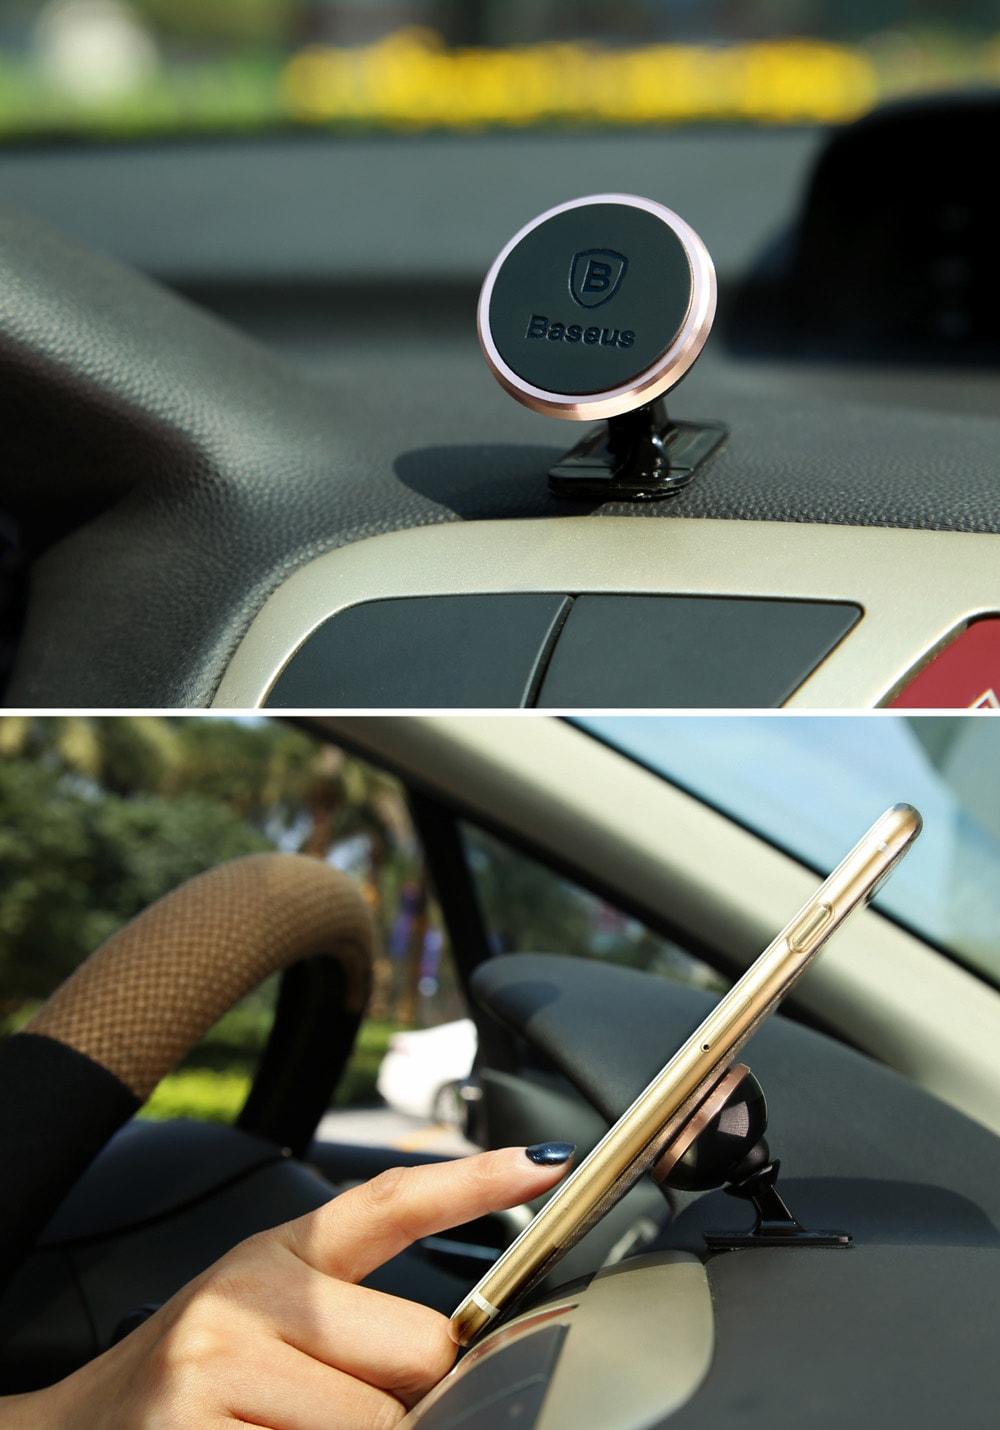 baseus 360 fokos magneses autos tarto 1 - Baseus 360 fokos mágneses autós tartó